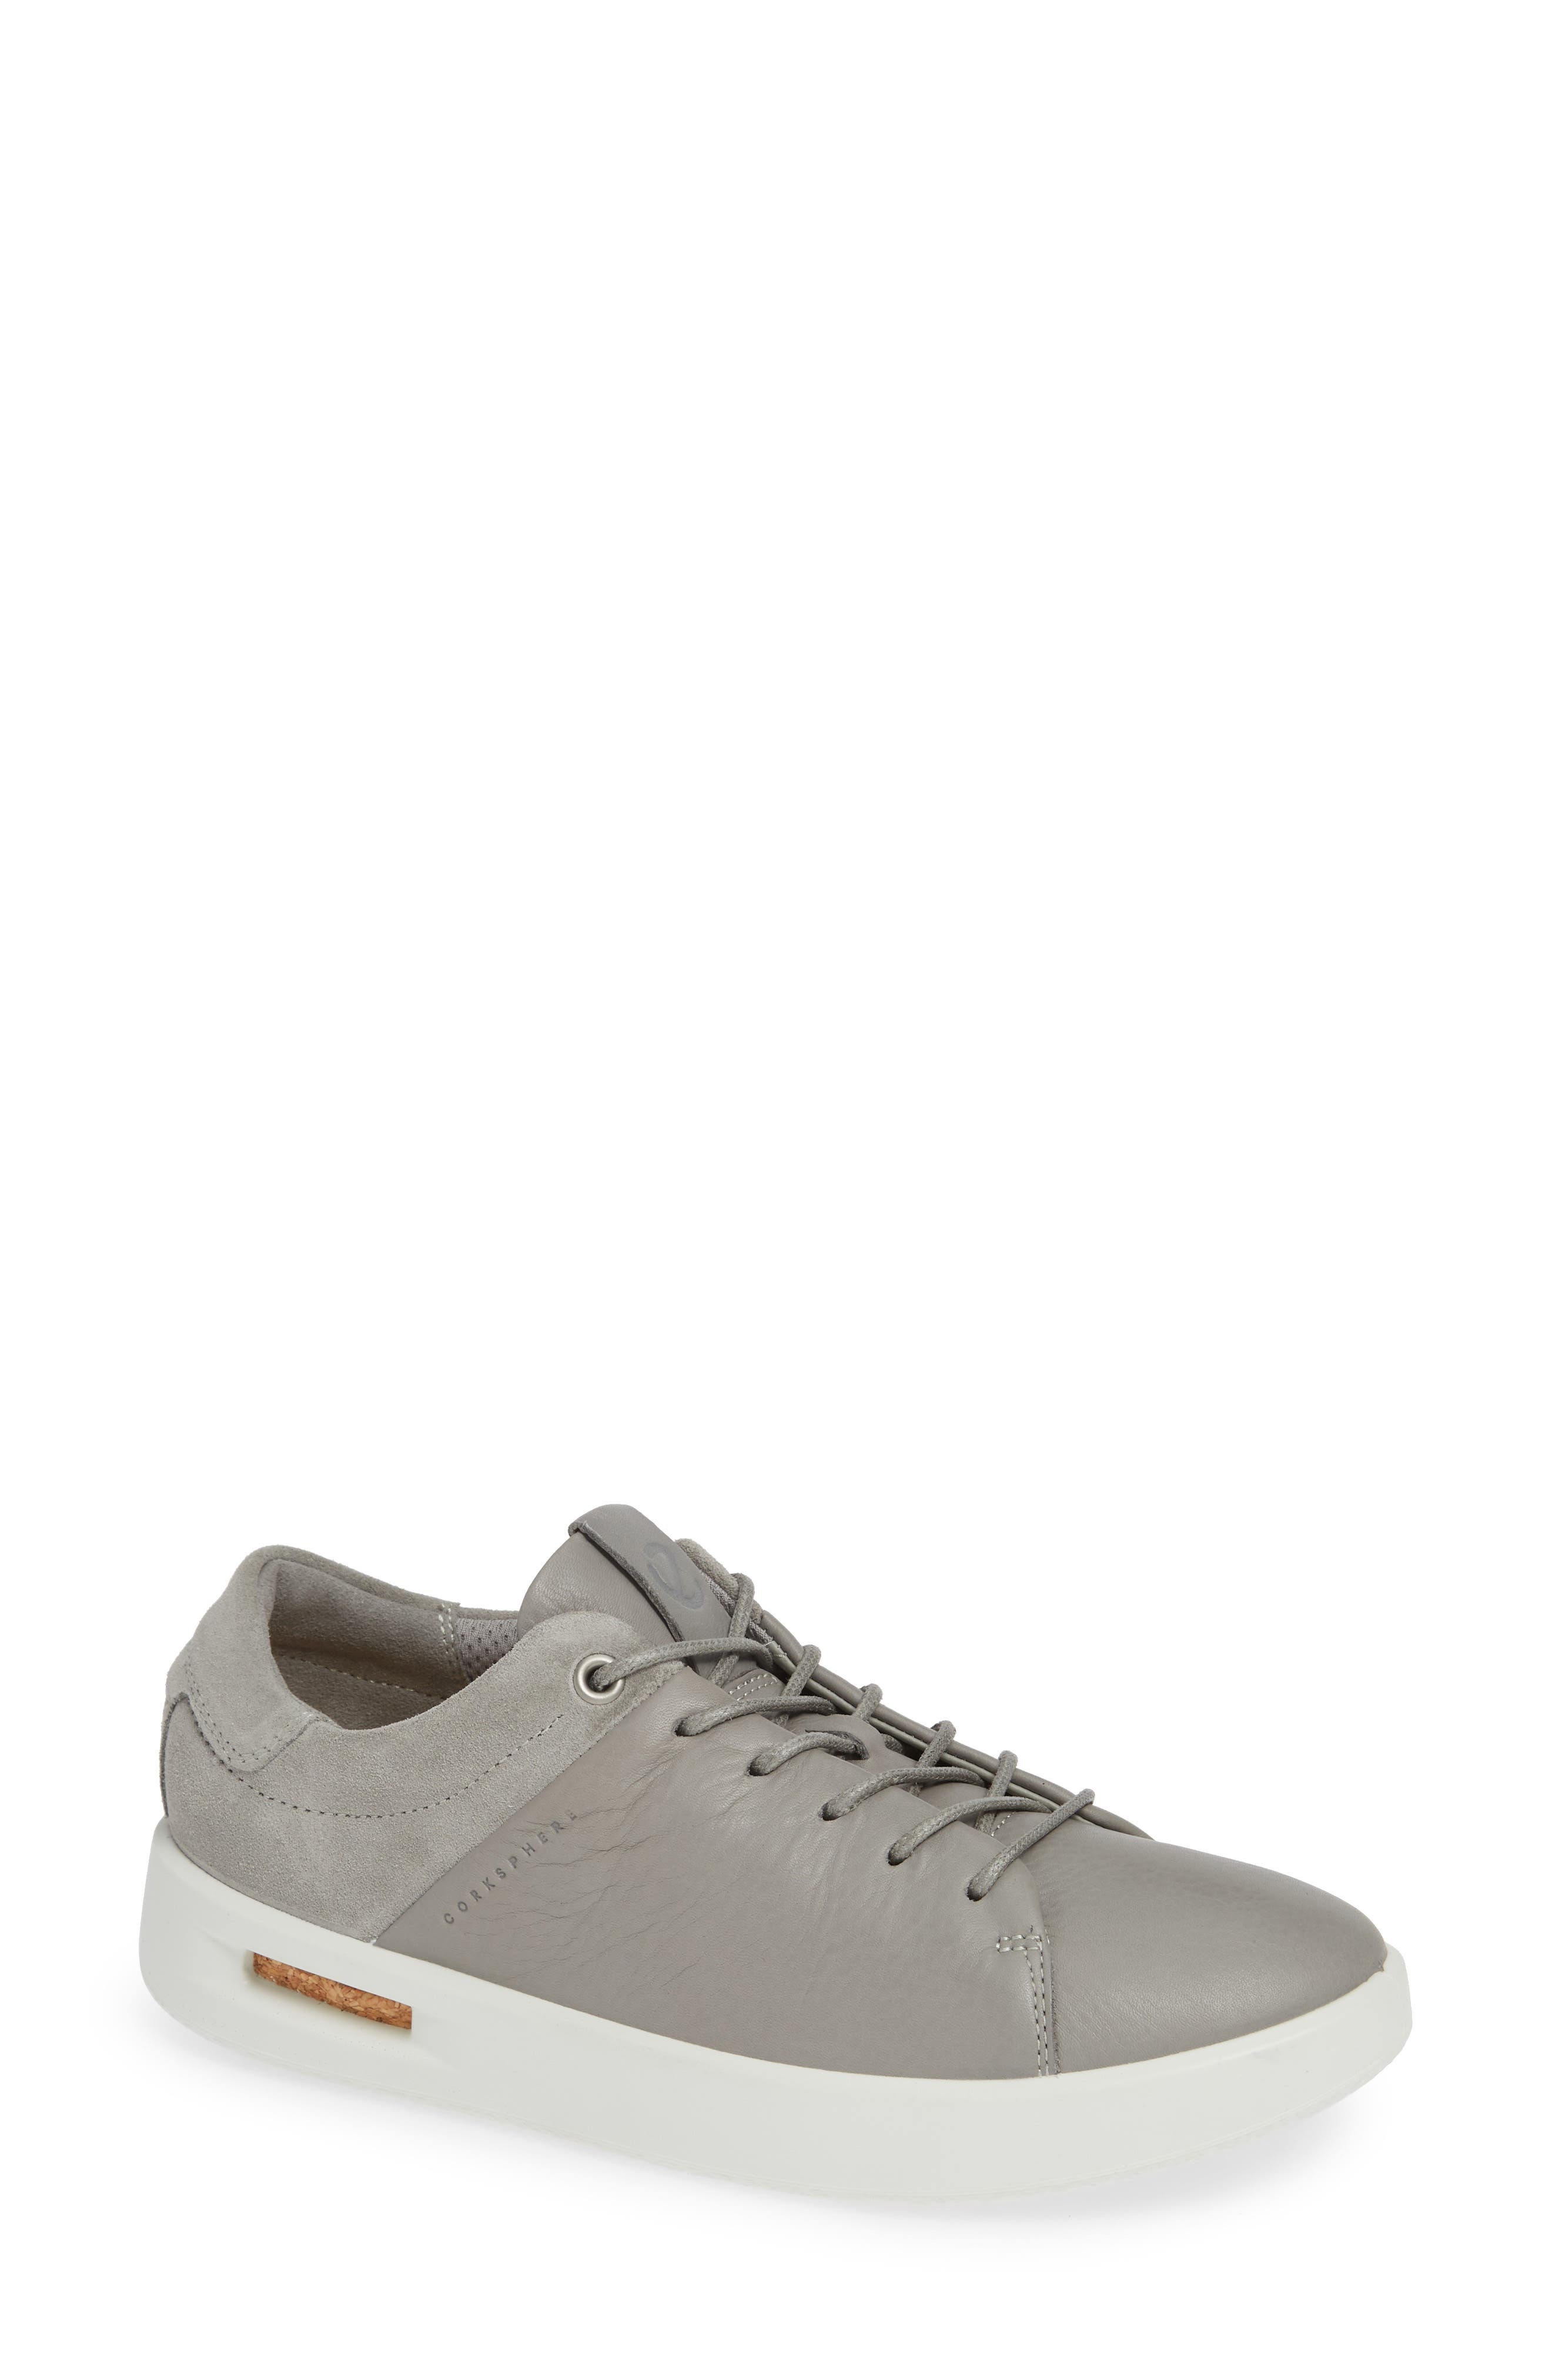 Ecco Corksphere Waterproof Sneaker, Grey